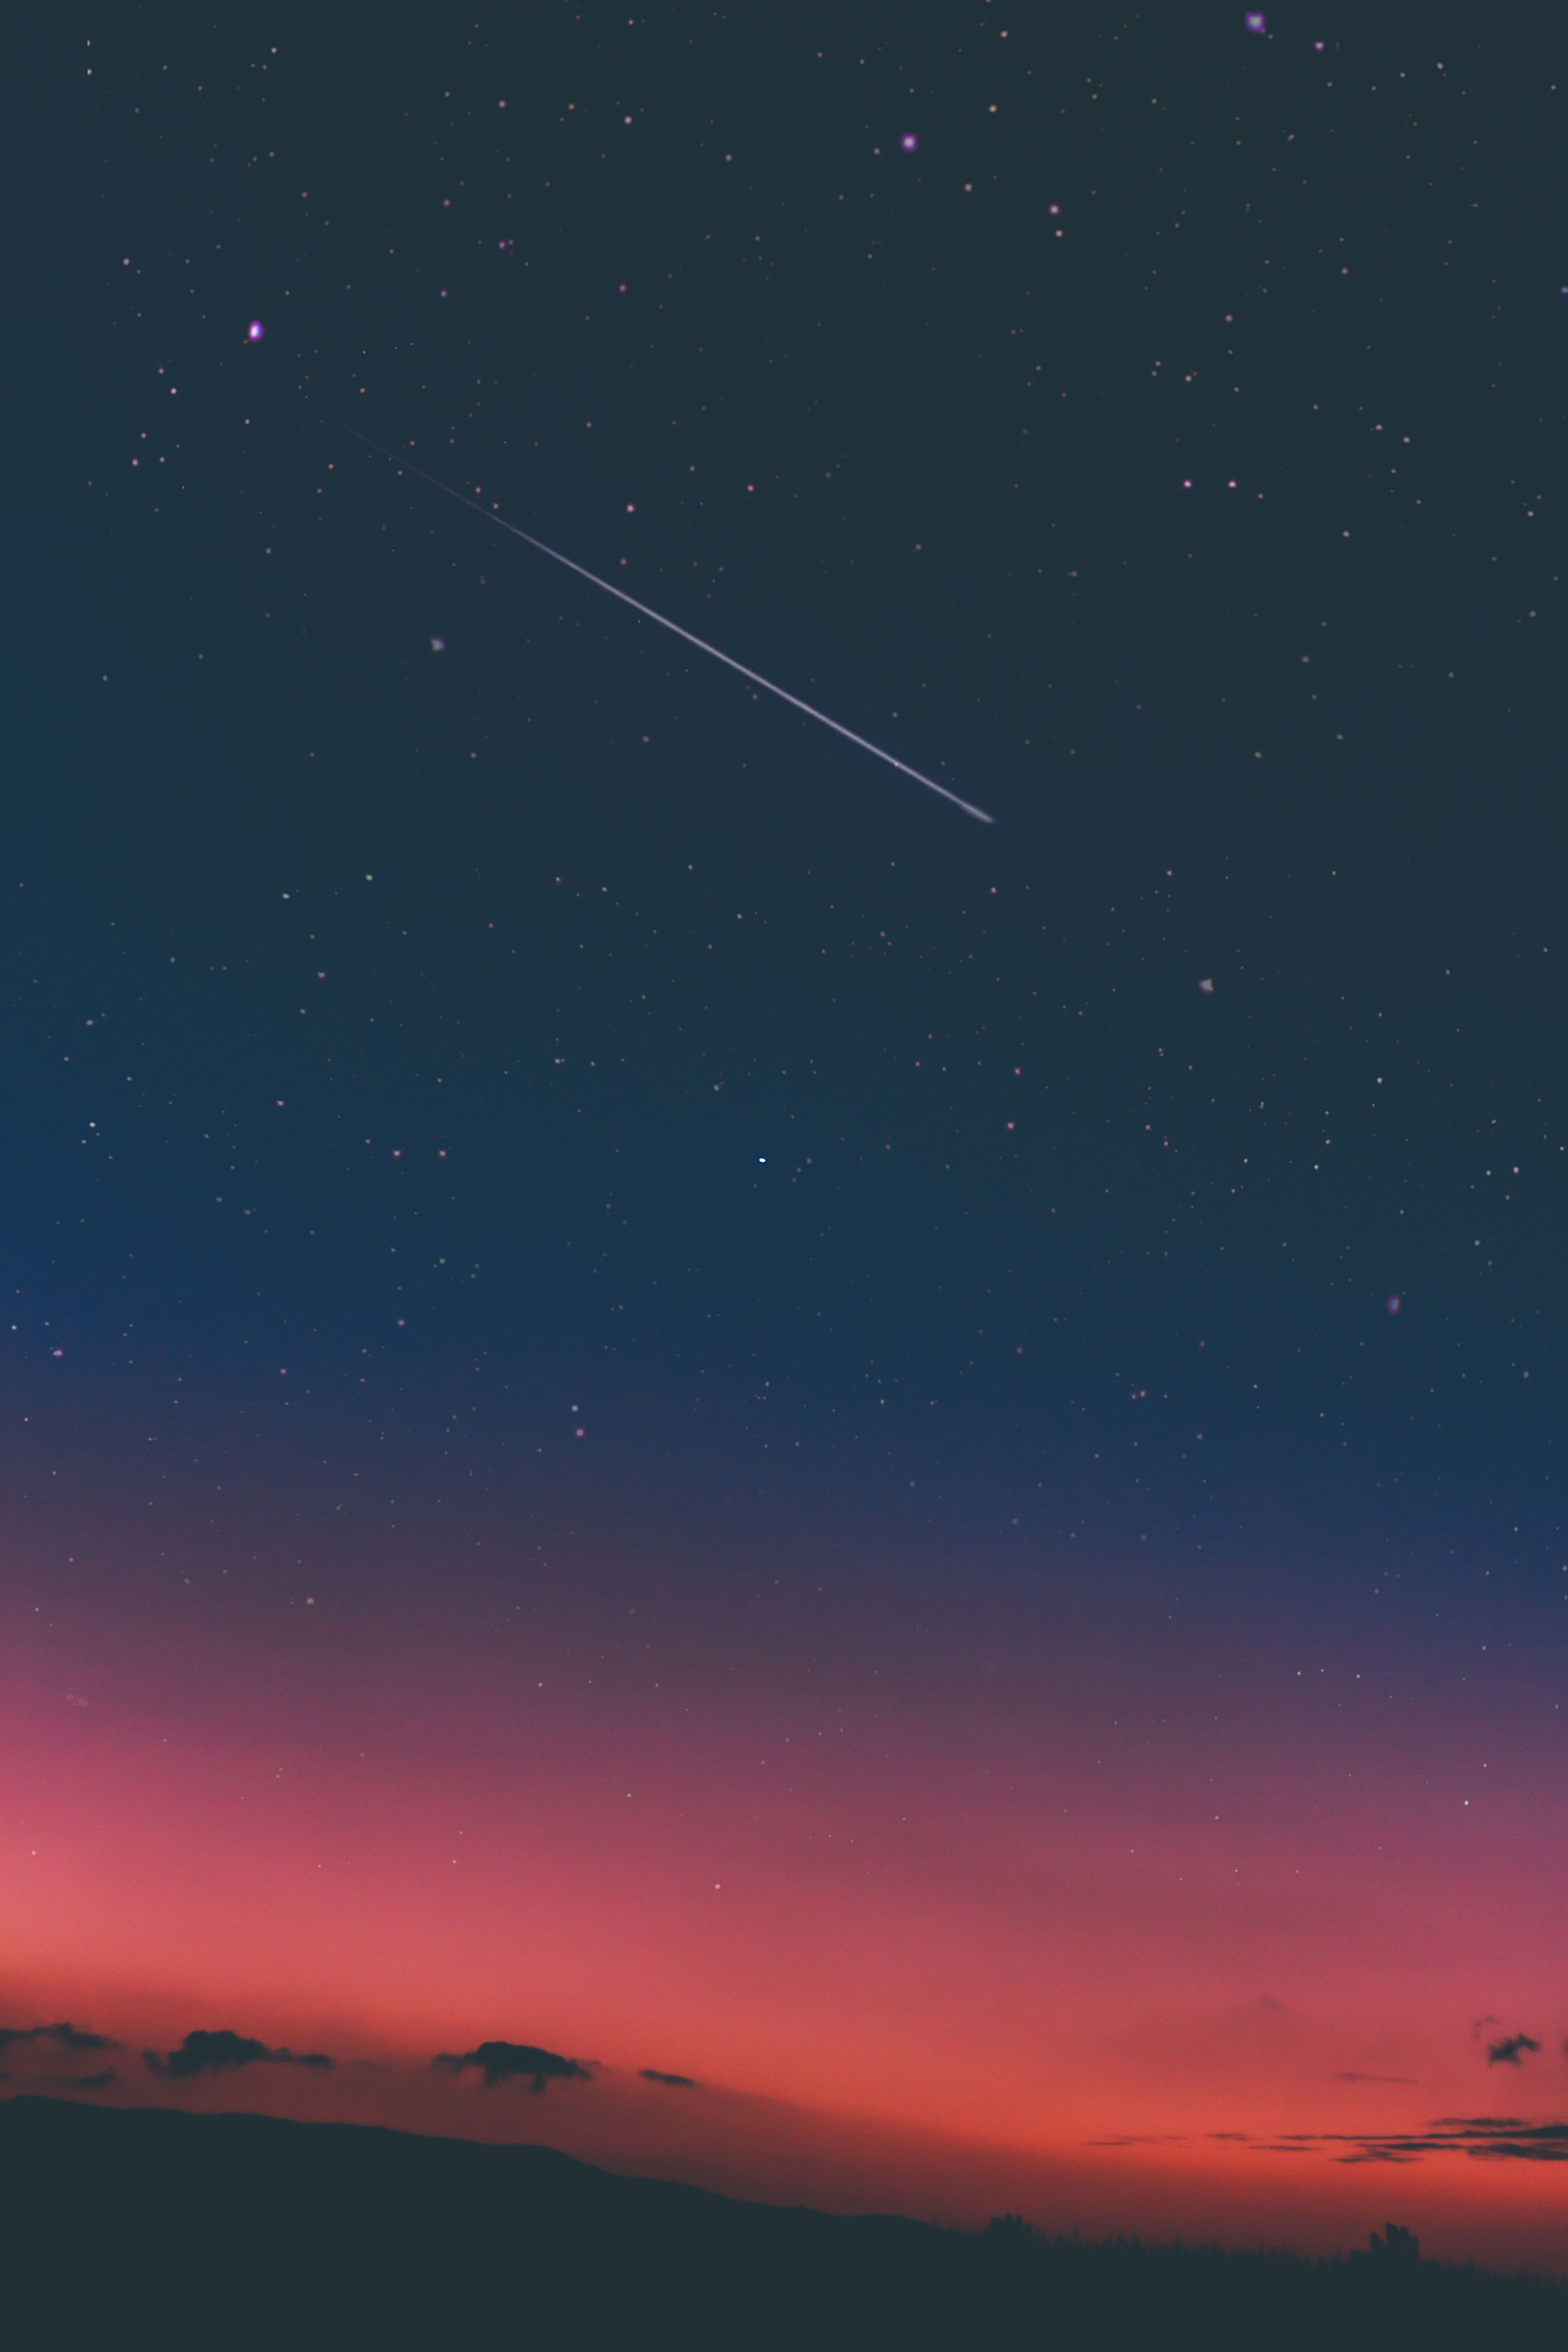 Shooting Star Photo By Diego Ph Jdiegoph On Unsplash Night Sky Photos Sky Photos Star Wallpaper